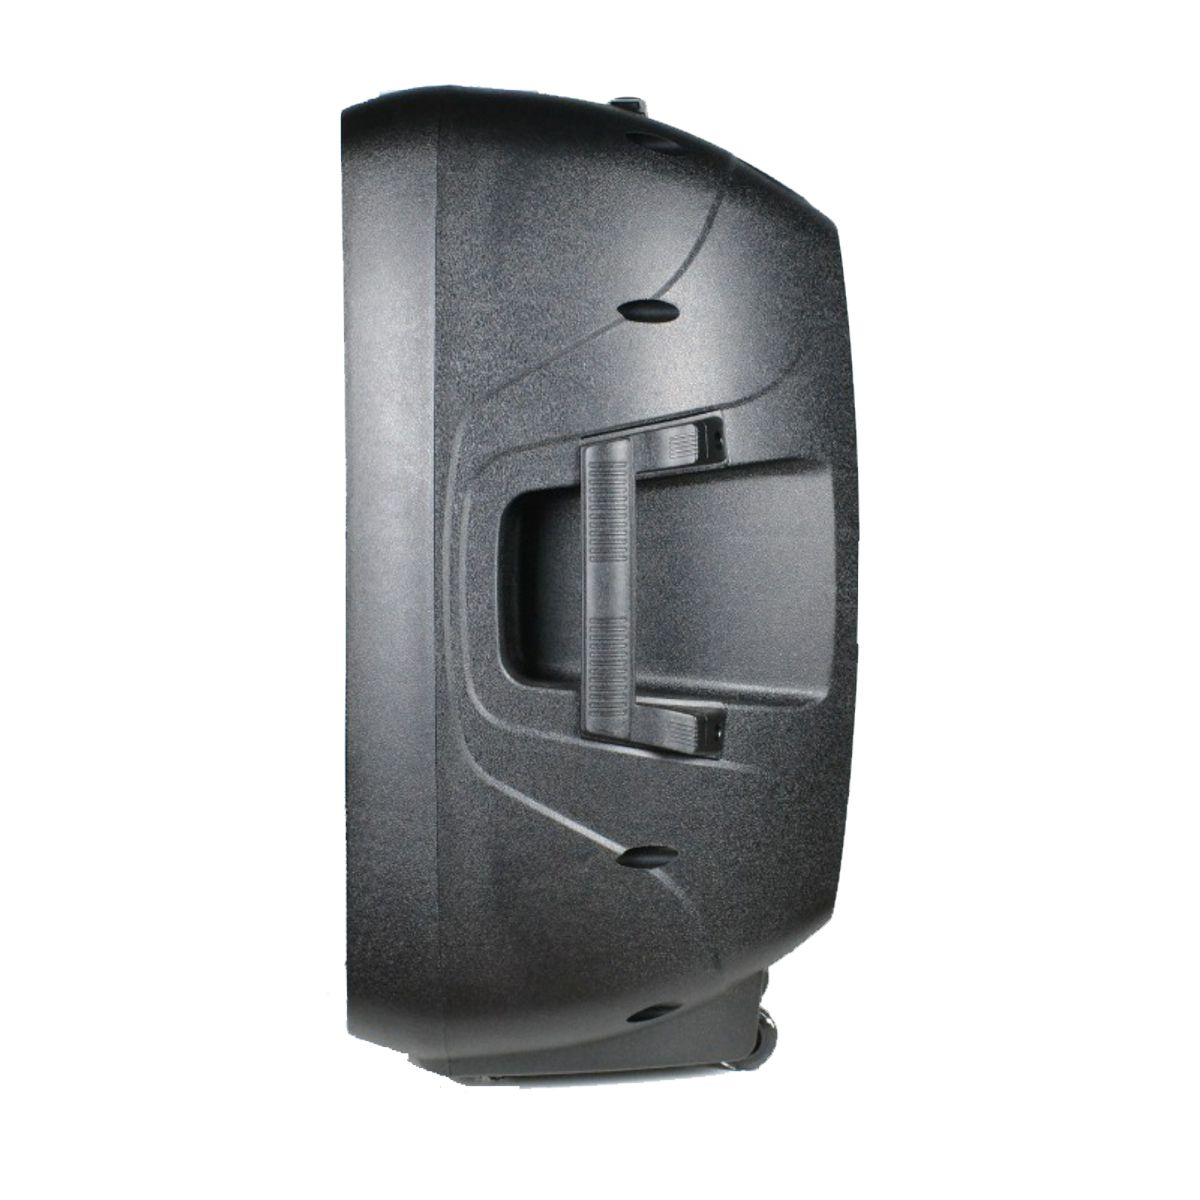 Caixa De Som Passiva Leacs Fit 15 Abs 200w Rms